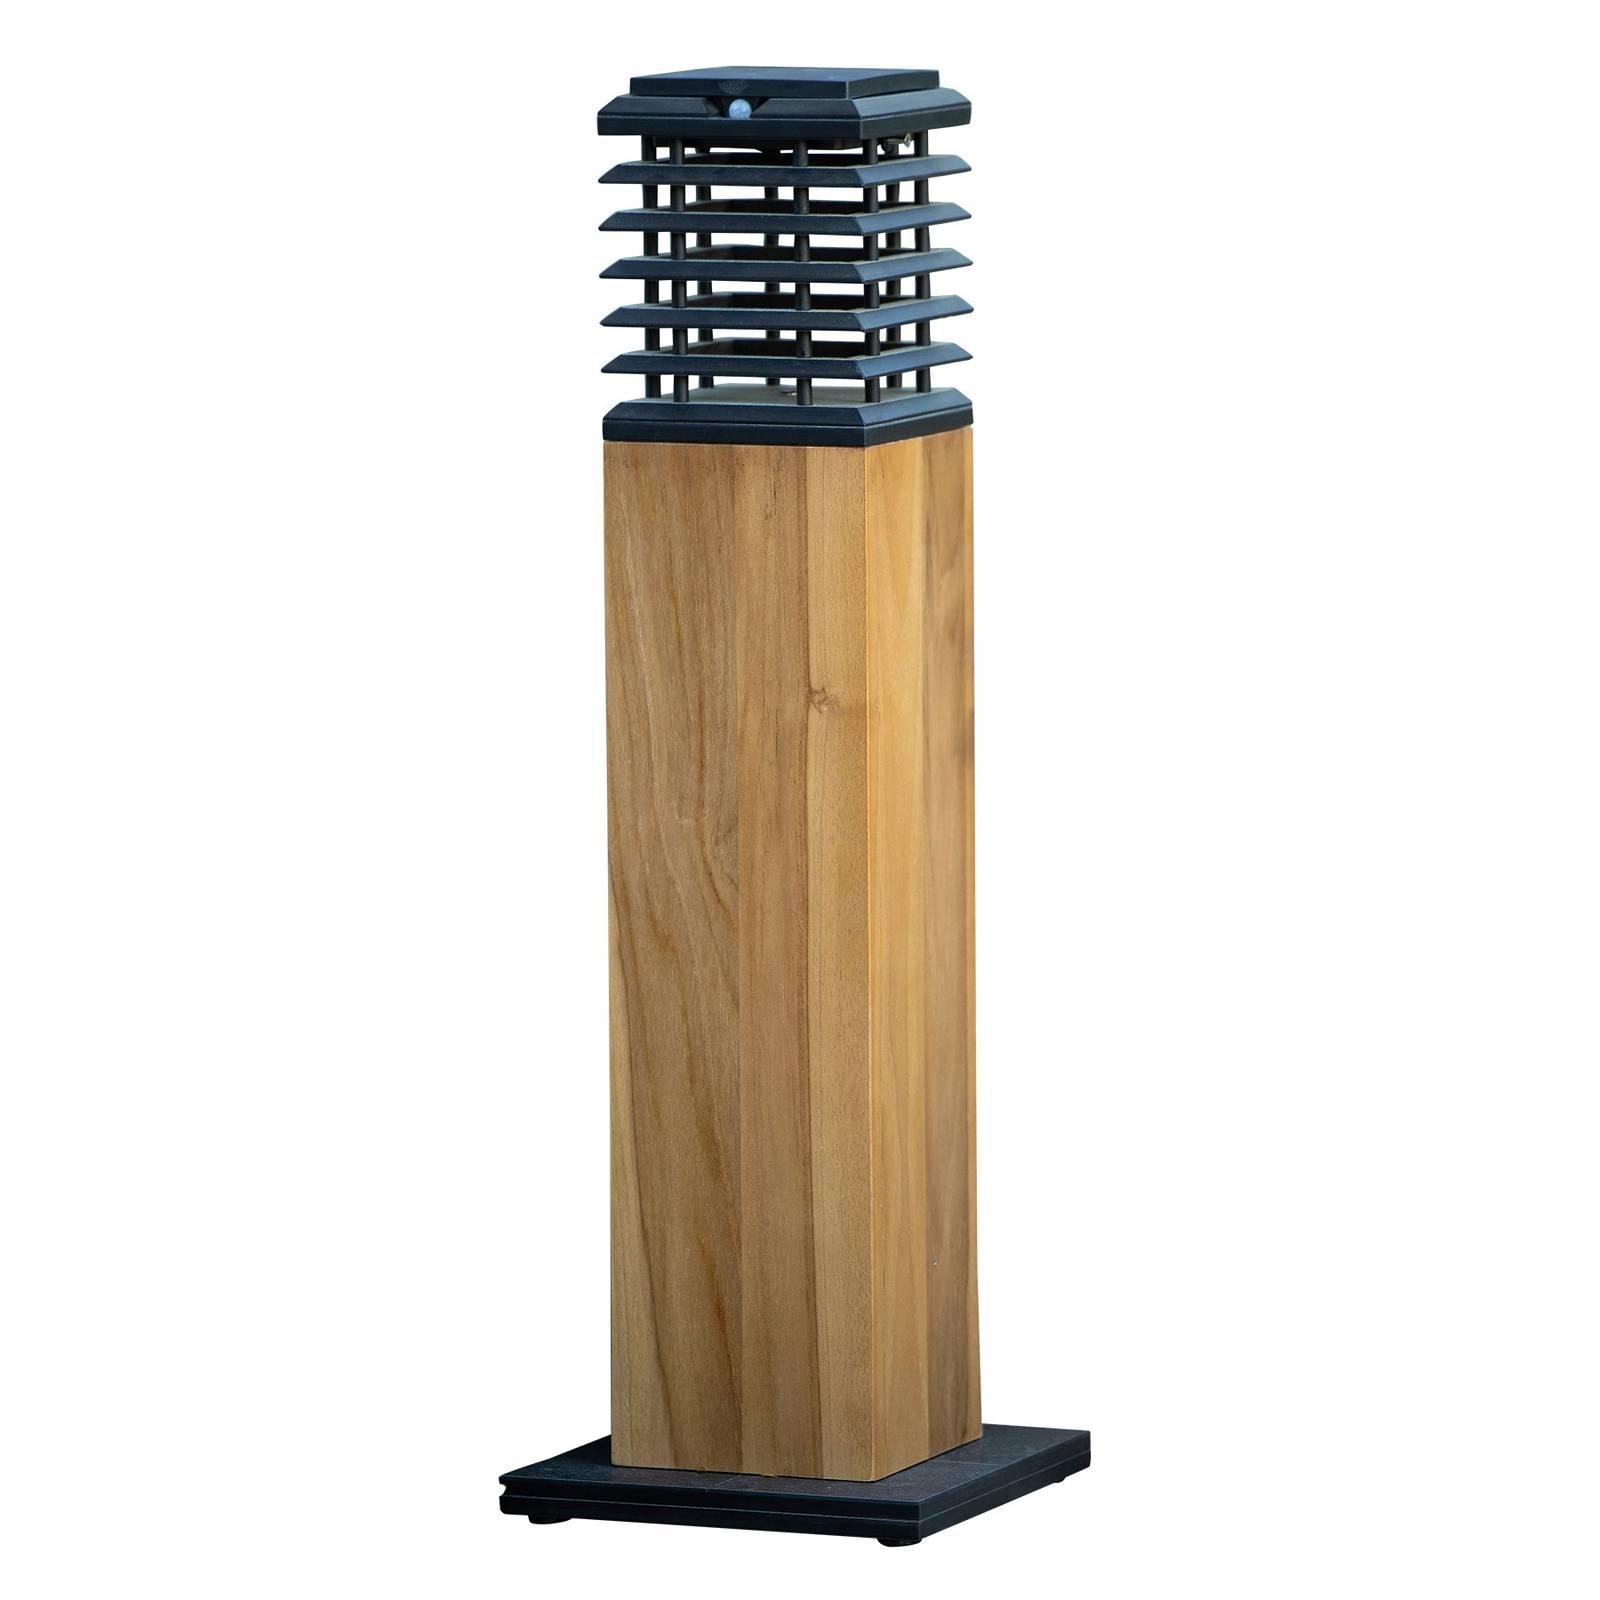 "*NEU*: LED-Wegleuchte ""Tekura"" aus Terracotta, groß, anthrazit (Kopie) Pötschke (Kopie)"